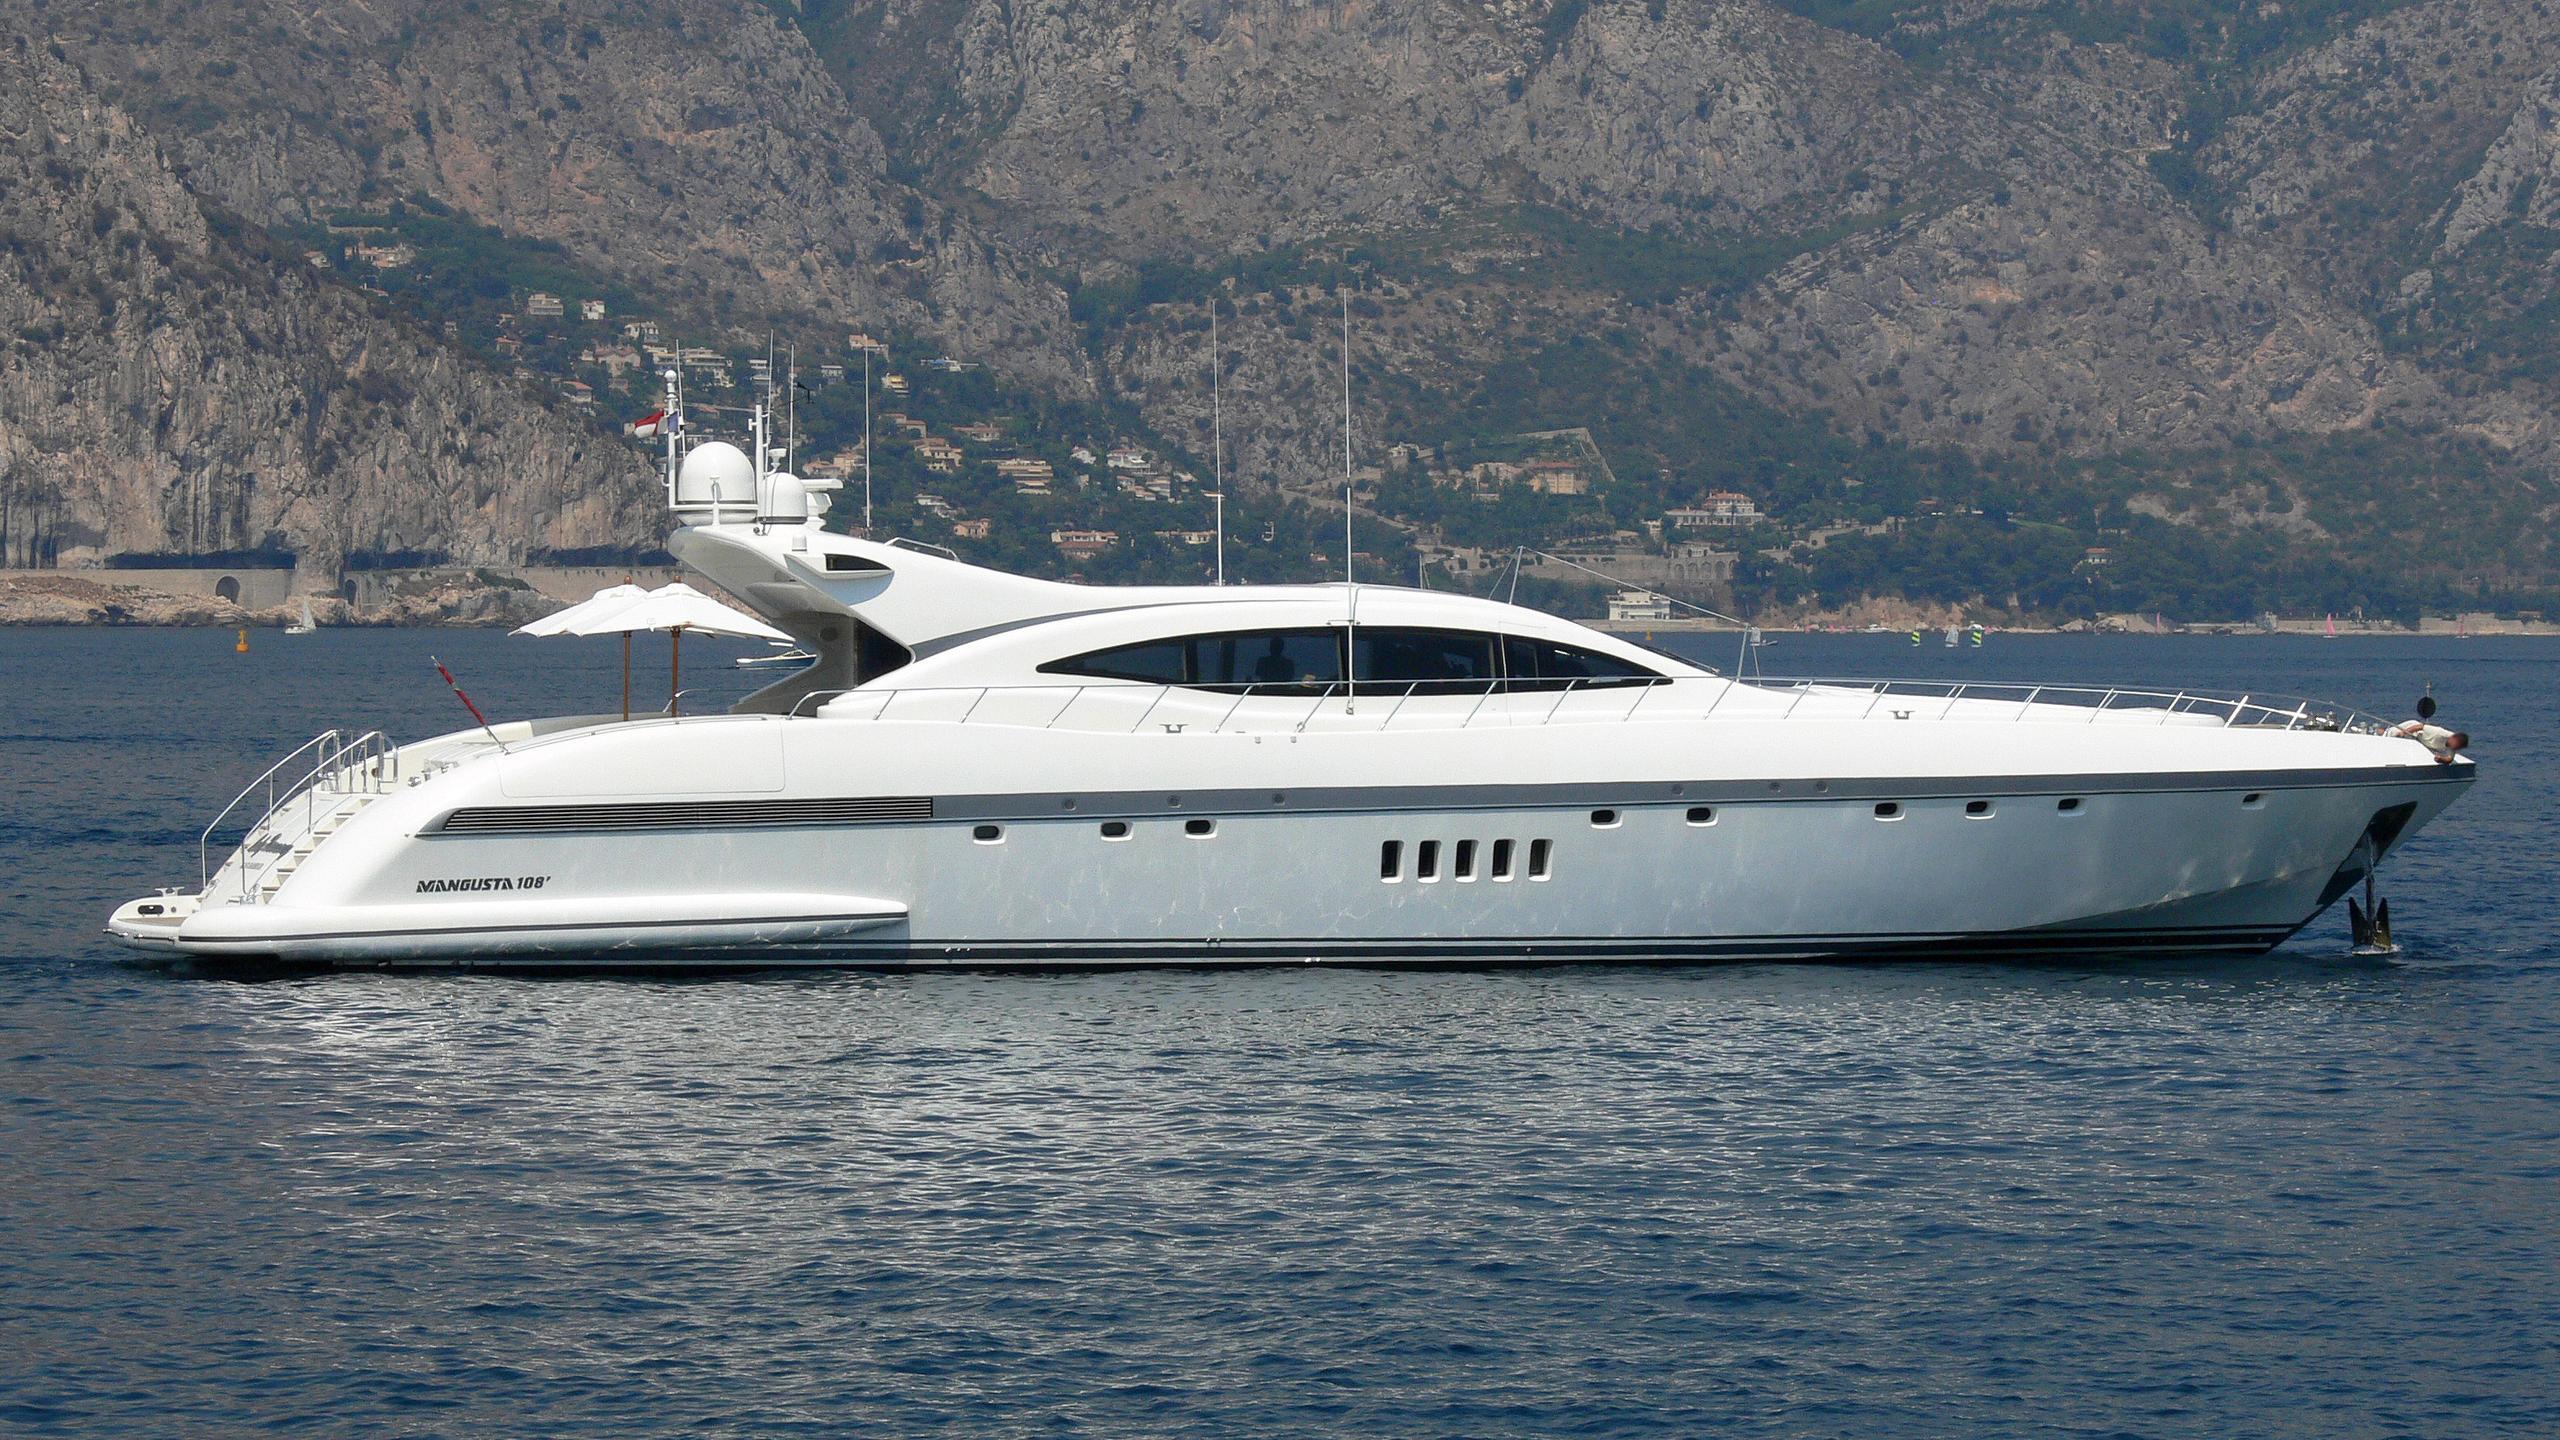 jff-motor-yacht-overmarine-mangusta-108-sport-2001-33m-profile-before-refit